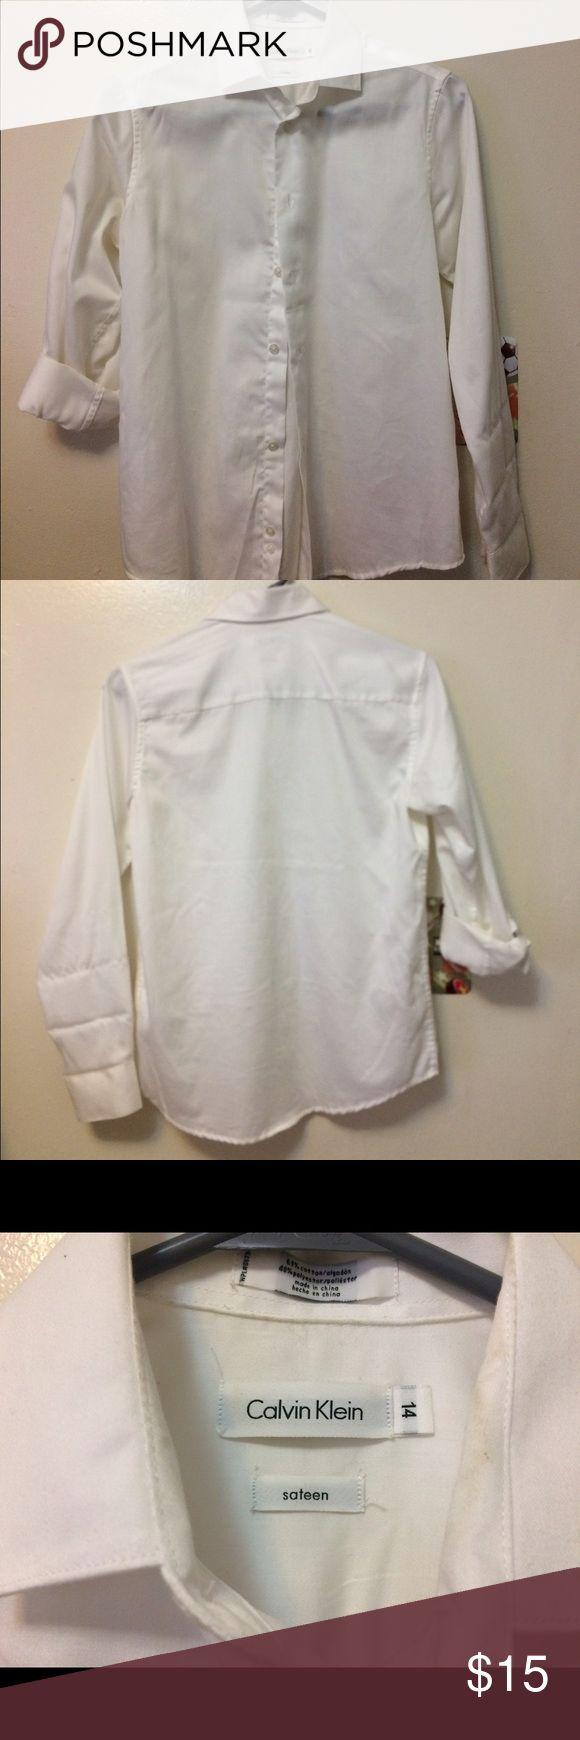 Boys' Plain White Shirt Size 14, 60% Cotton, 40% Polyester, Calvin Klein Shirts & Tops Button Down Shirts